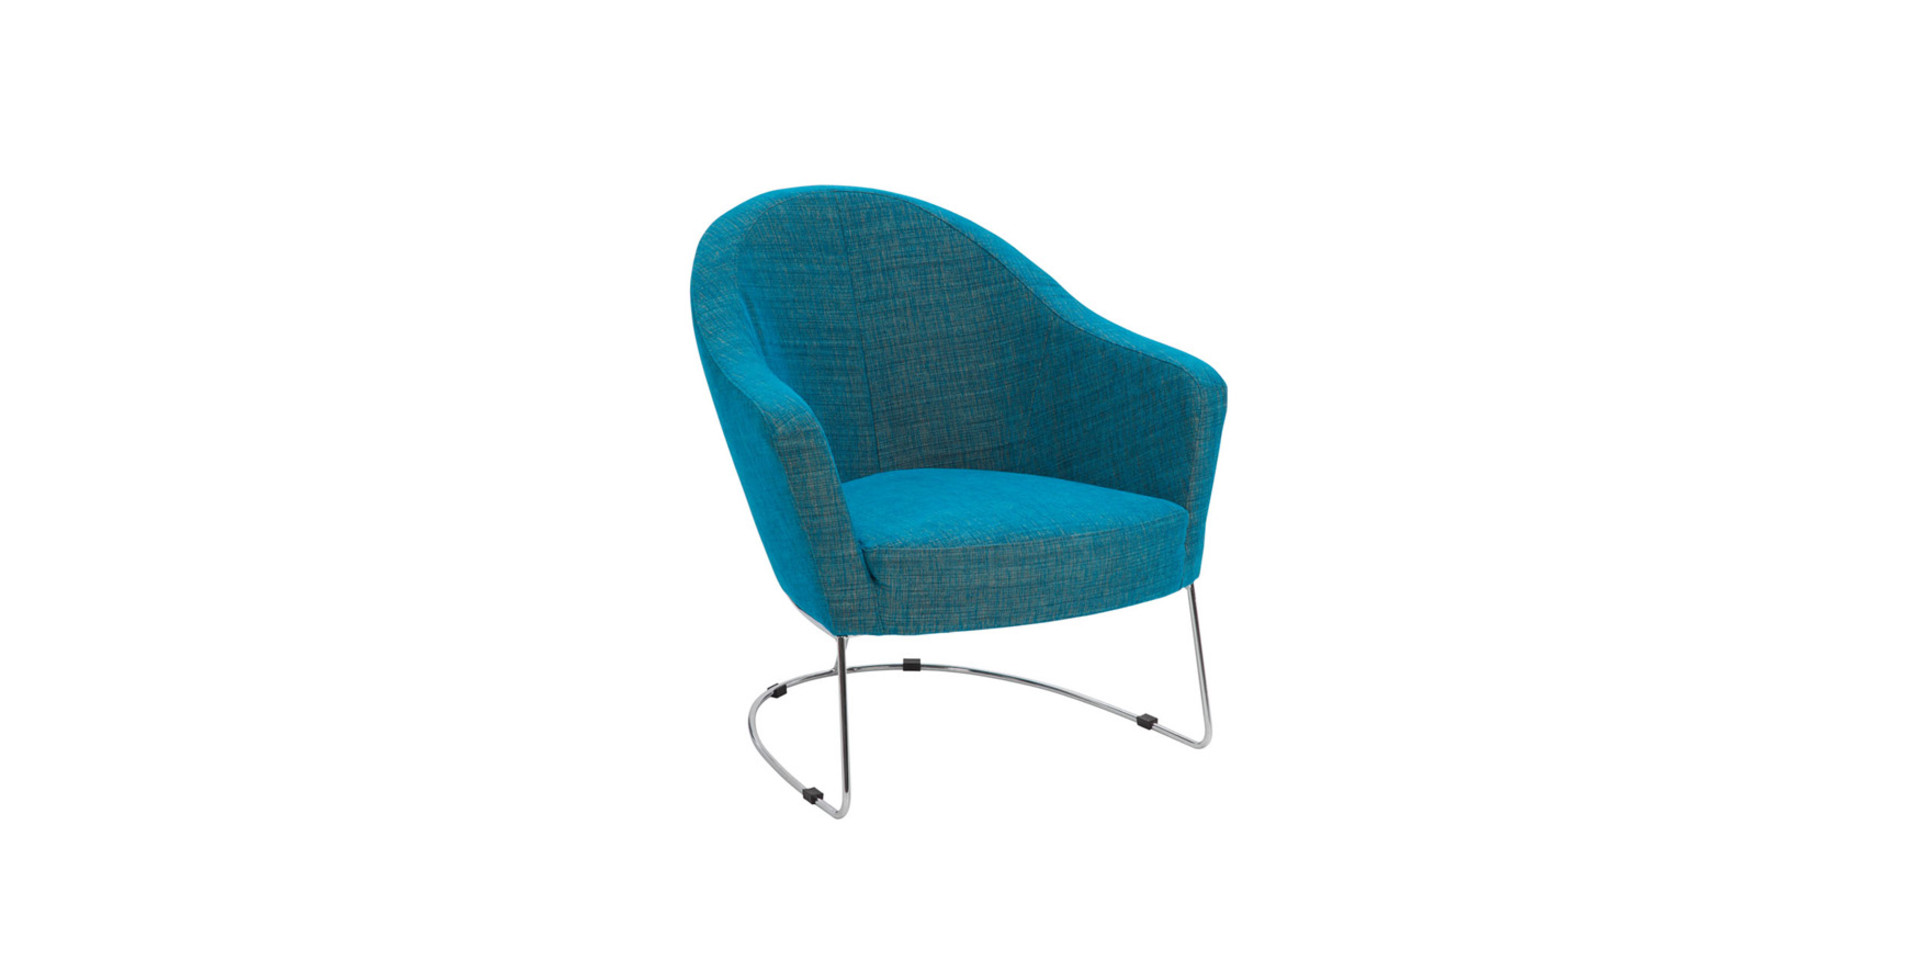 sits-nina-fauteuil-merte787_turquoise_2_0